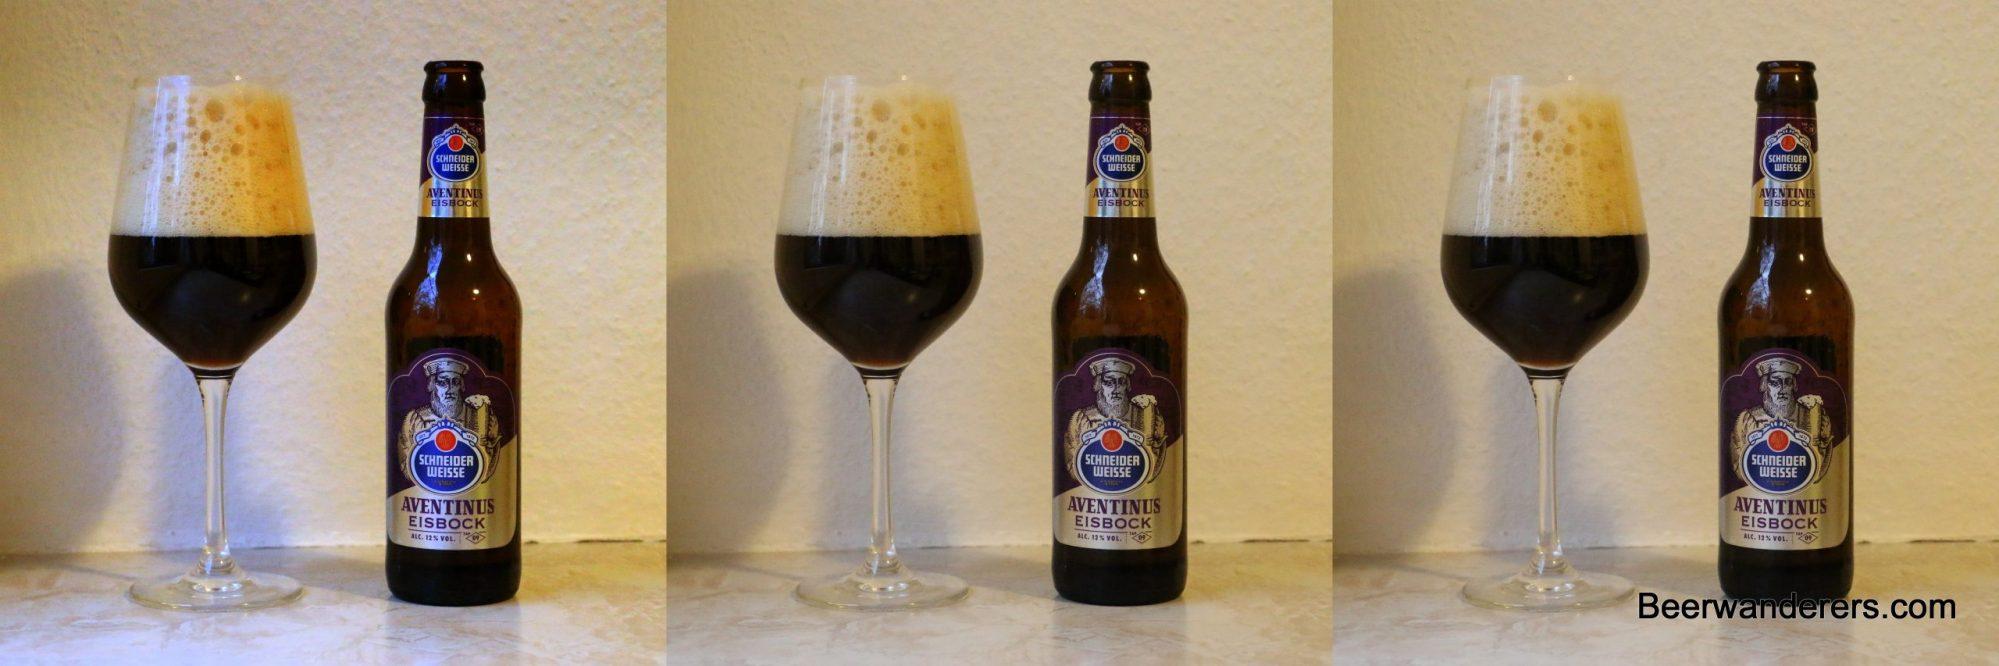 dark beer in wineglass with bottle x three